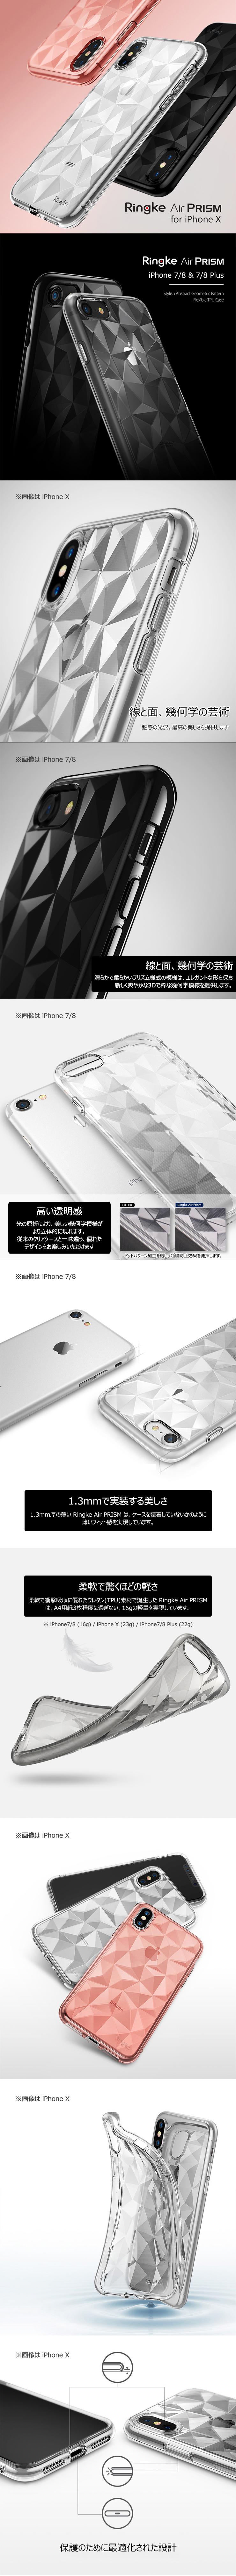 Iphone7 Iphone8 Ringke Air Prism For Iphone 7 Plus Ink Black